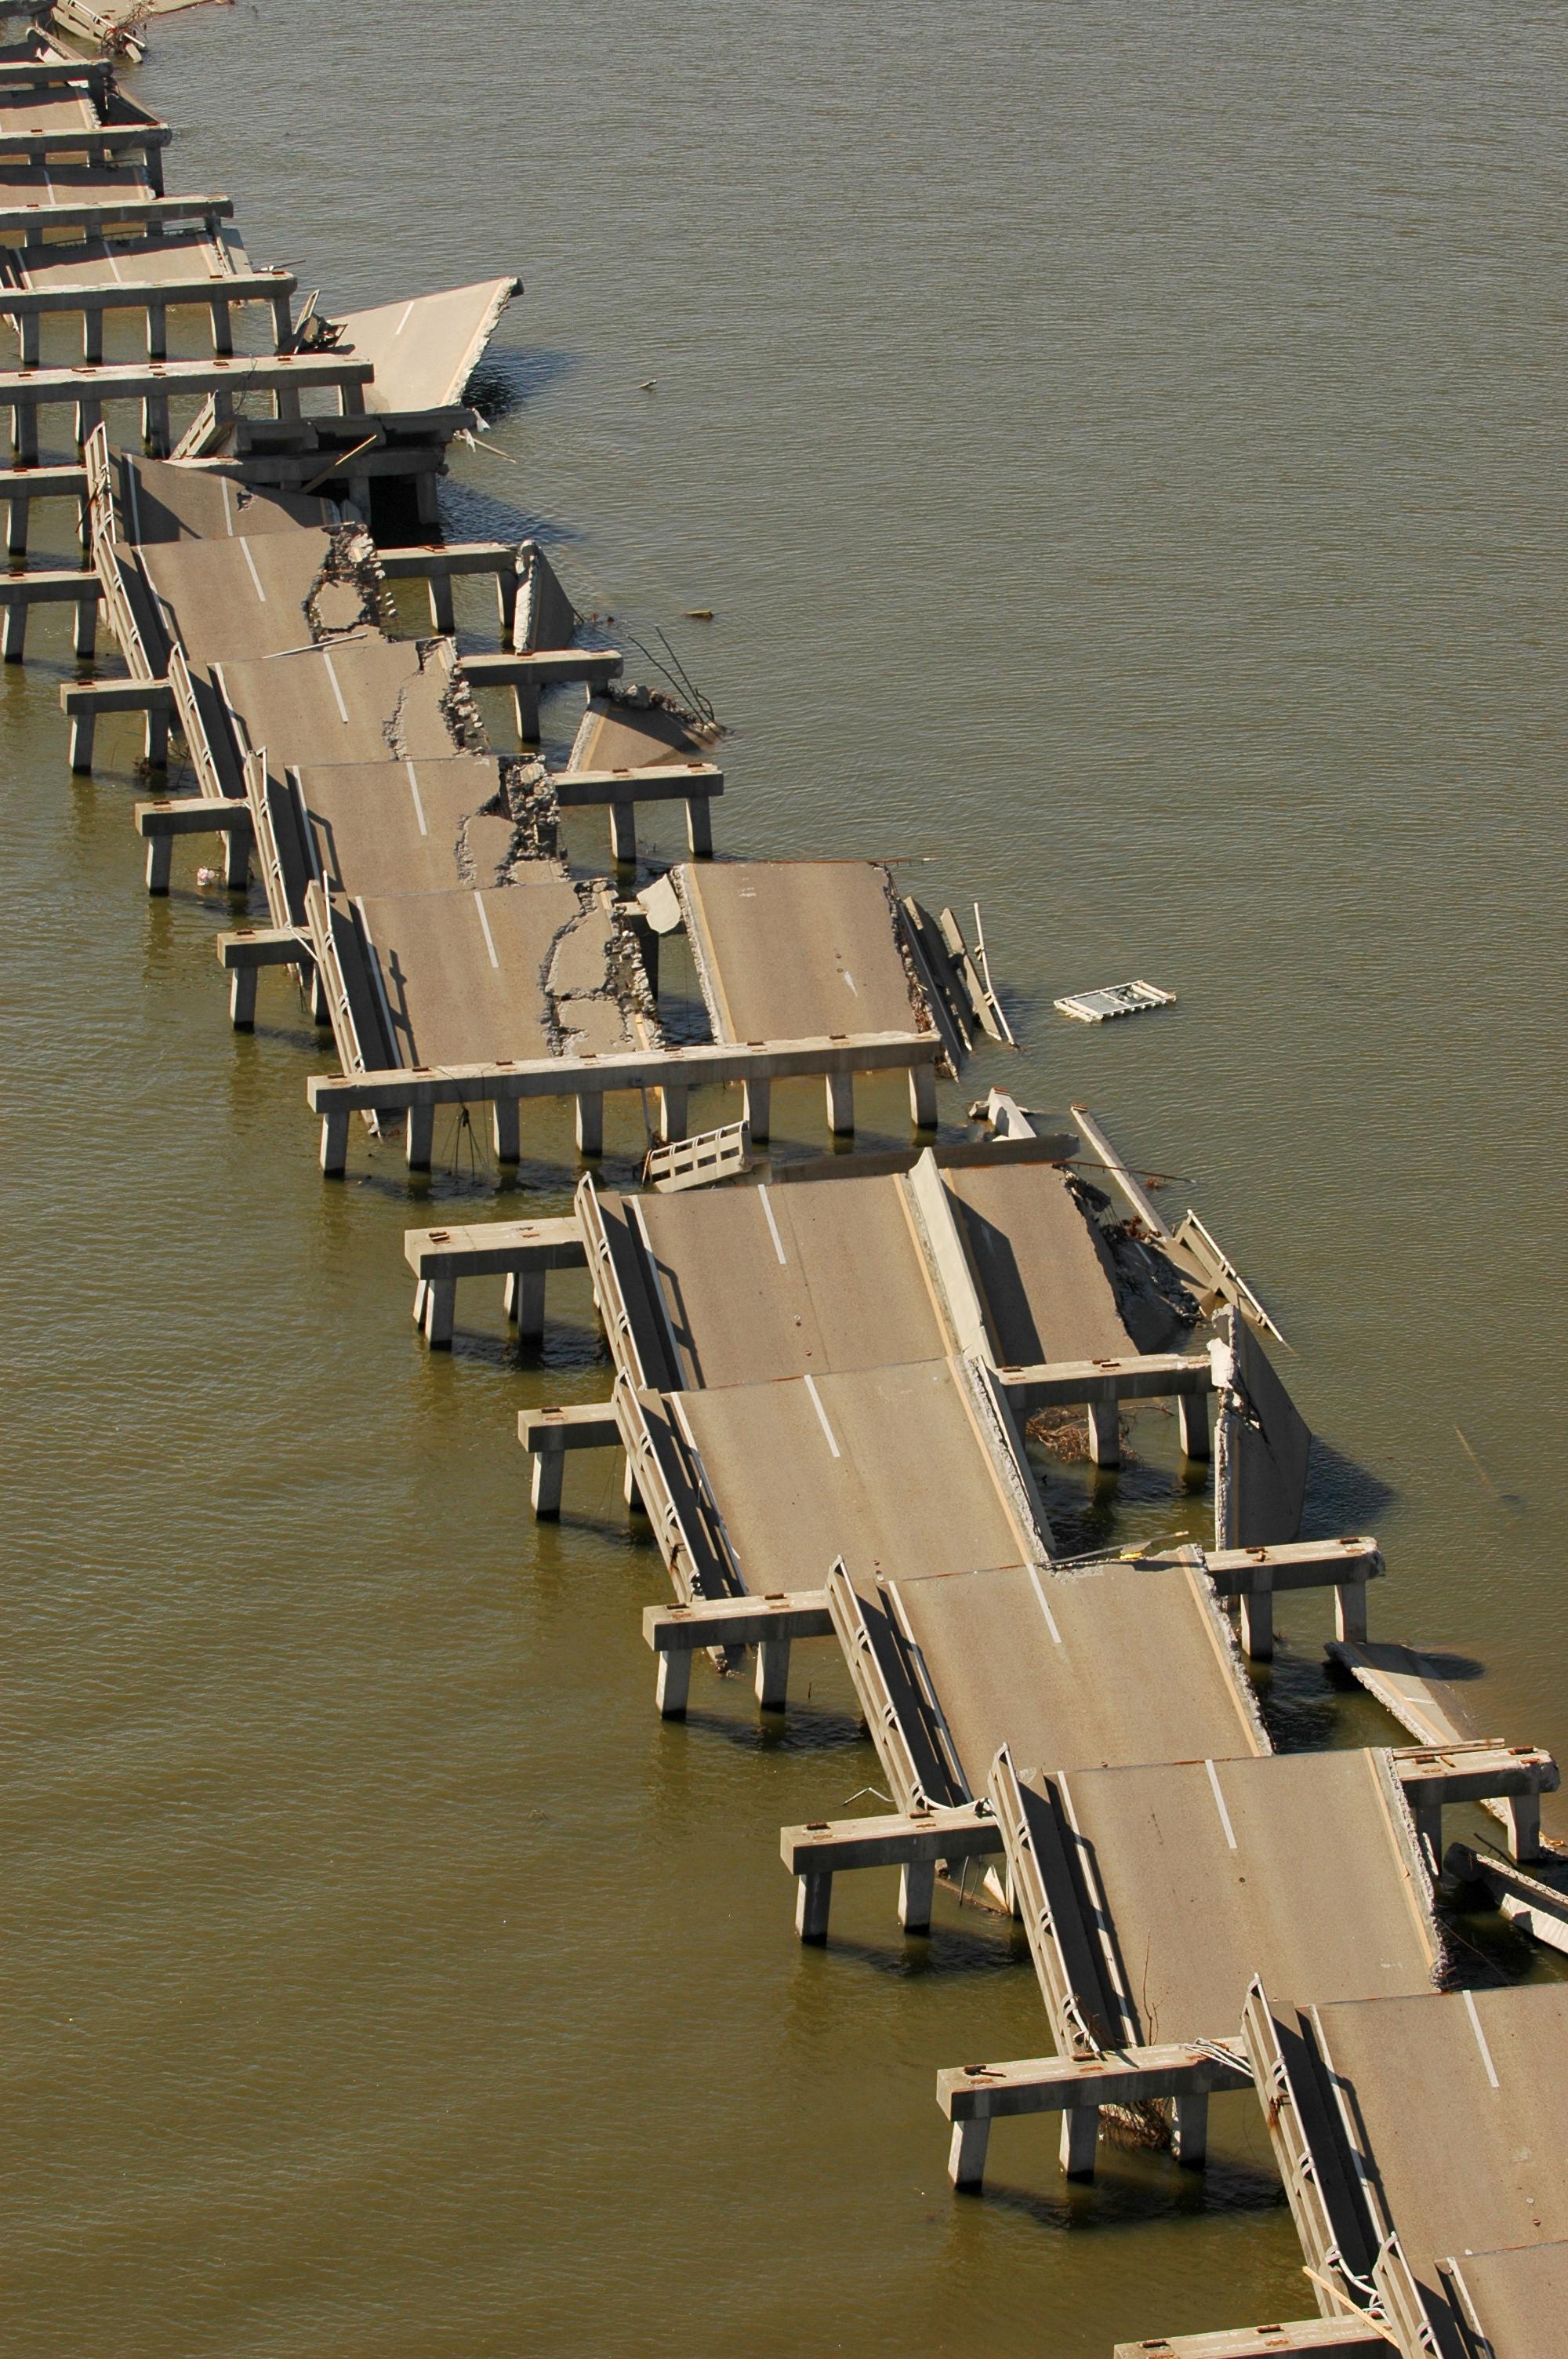 The Bay bridge on US Highway 90, damaged by Hurricane Katrina